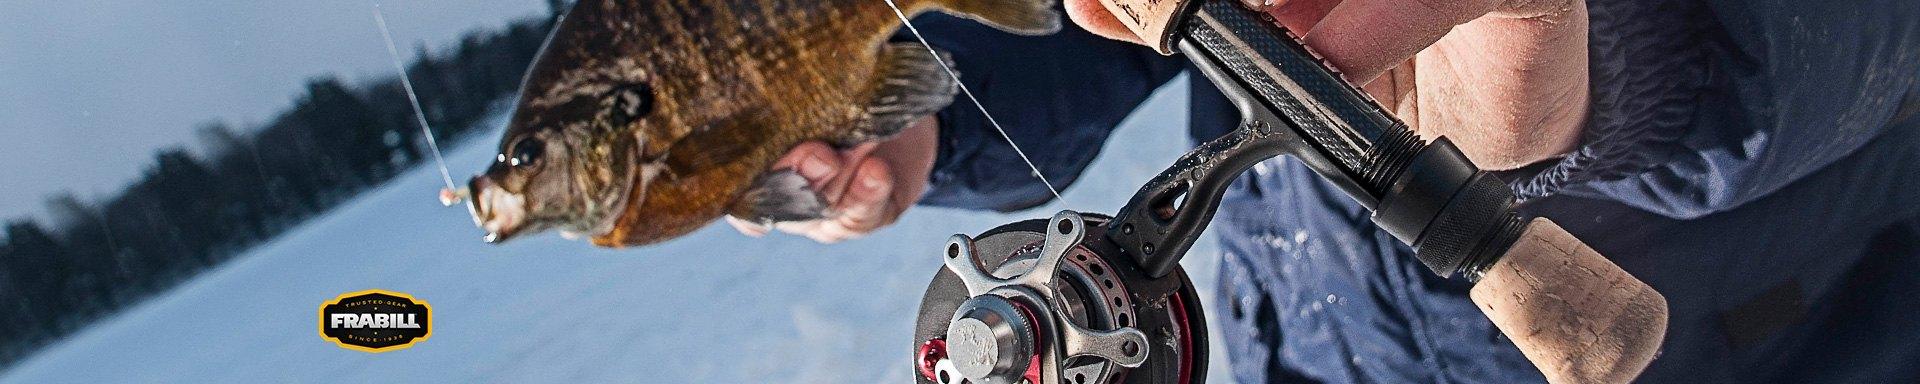 Frabill Fishing Nets Bibs Ice Suits Bait Buckets